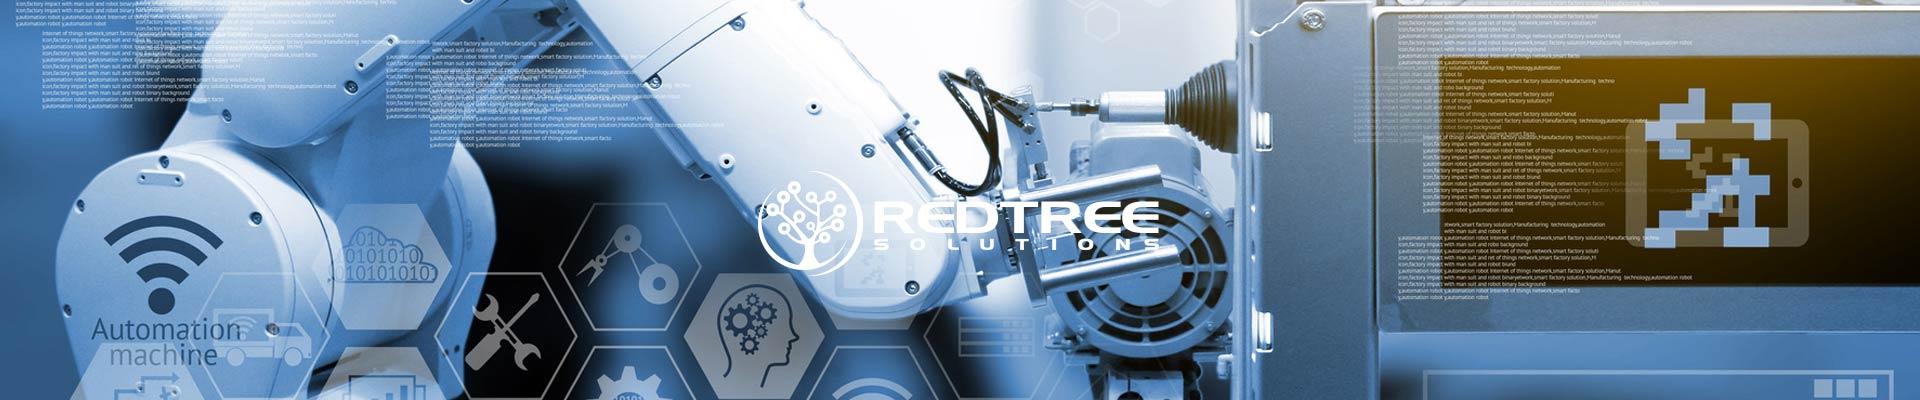 s-redtree-industry